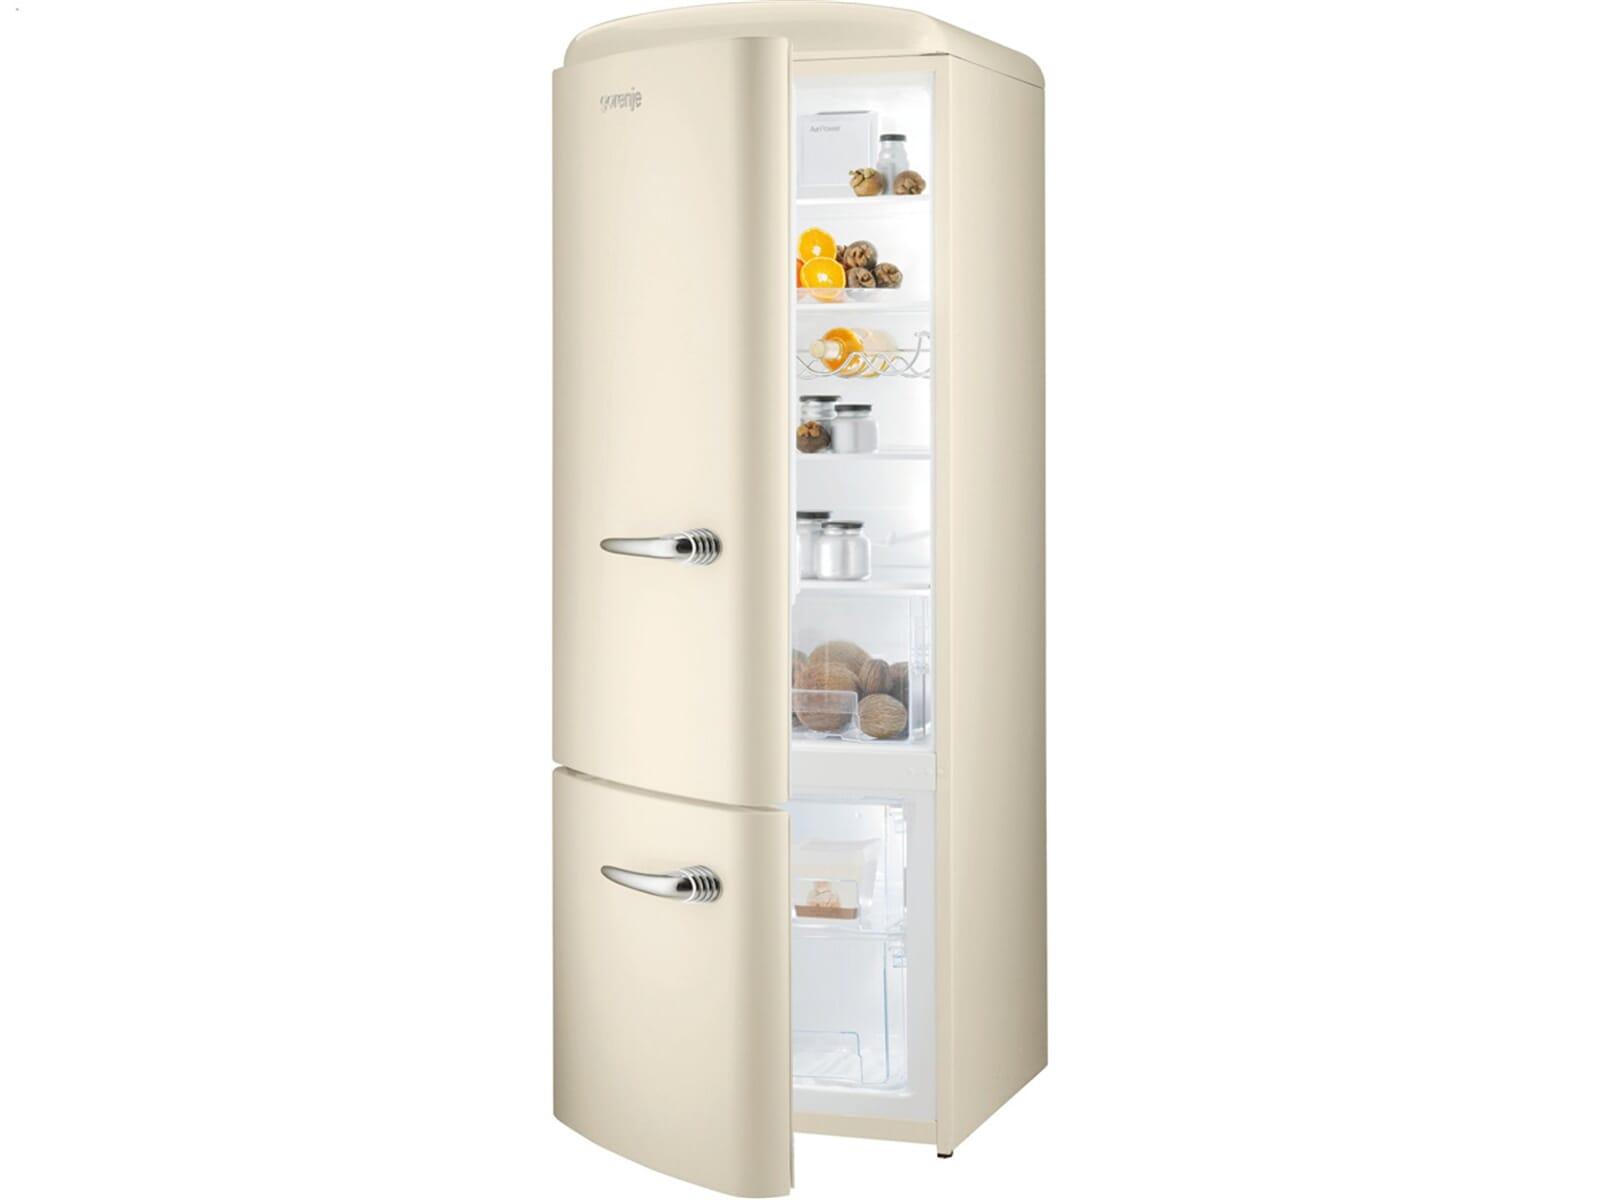 Gorenje Classico Kühlschrank : Gorenje bo clb gw clb gas elektro einbaubackofen set backofen